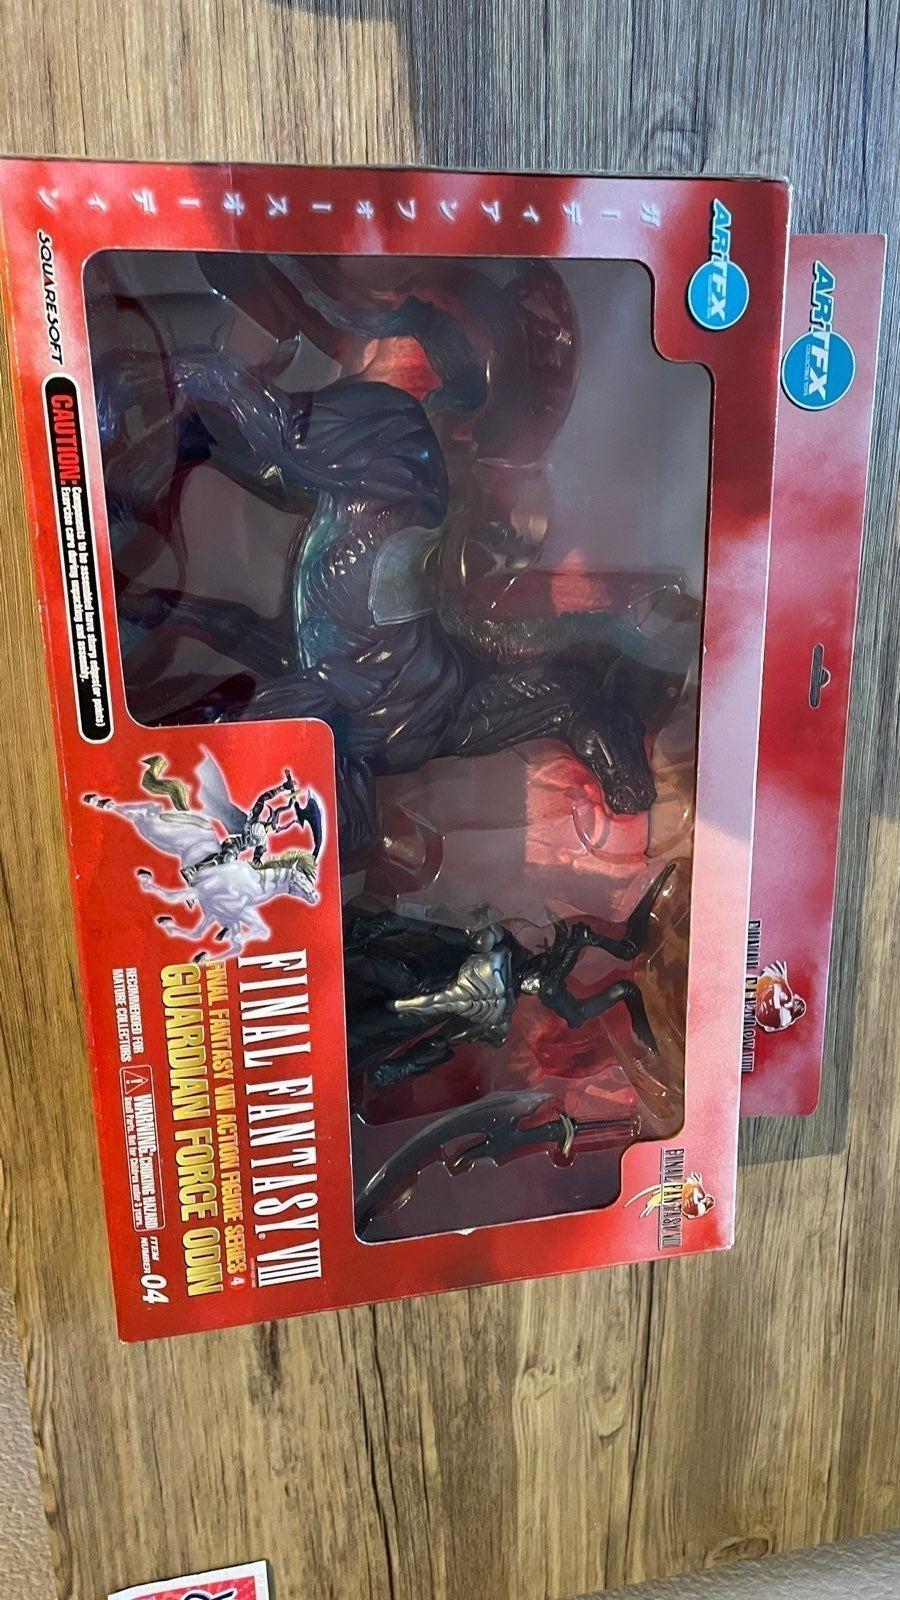 Final fantasy guardian 2 action figures